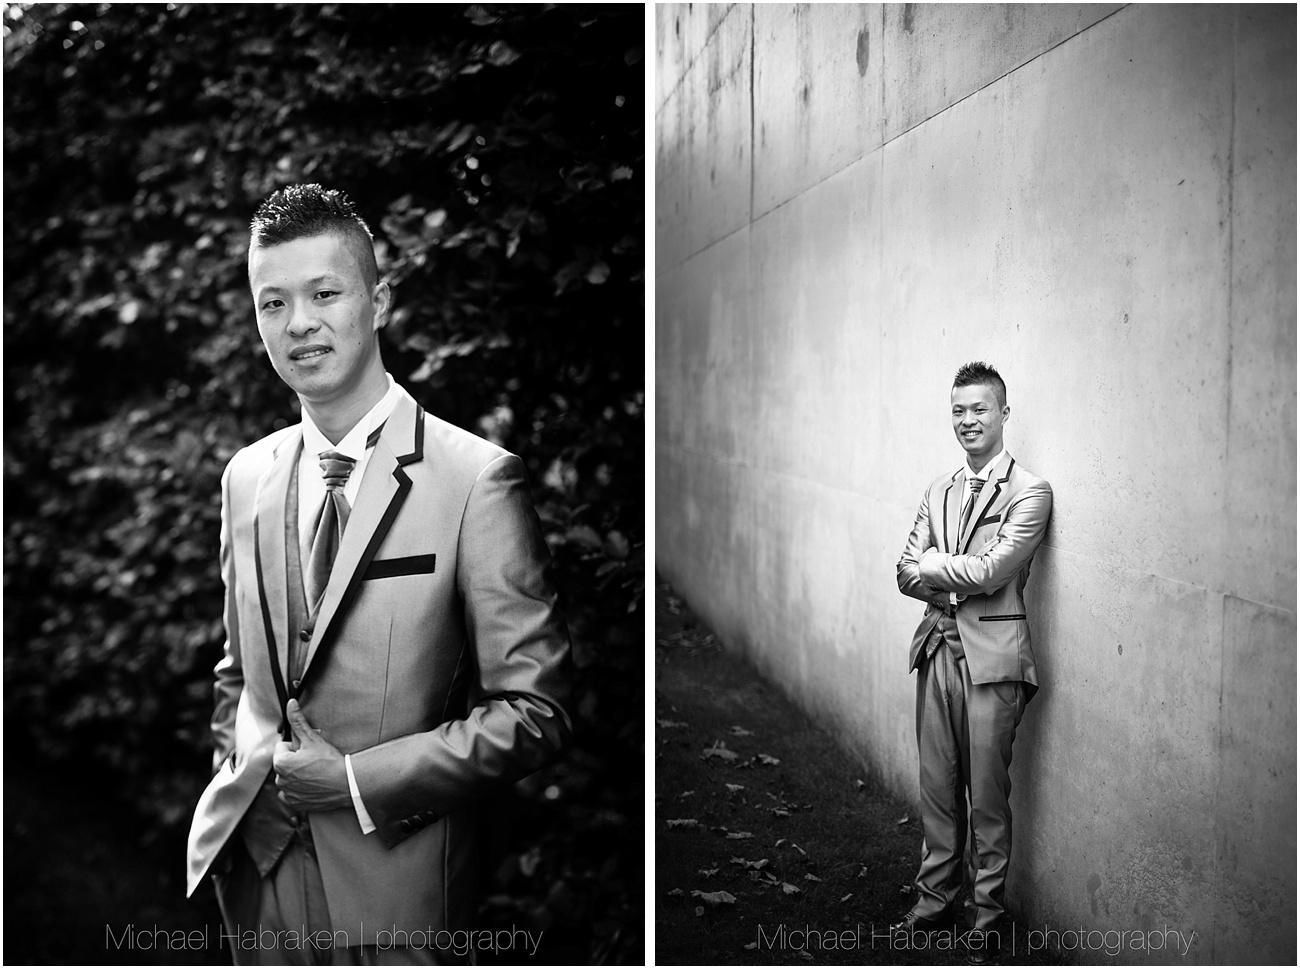 MichaelHabraken|photography_0683.jpg